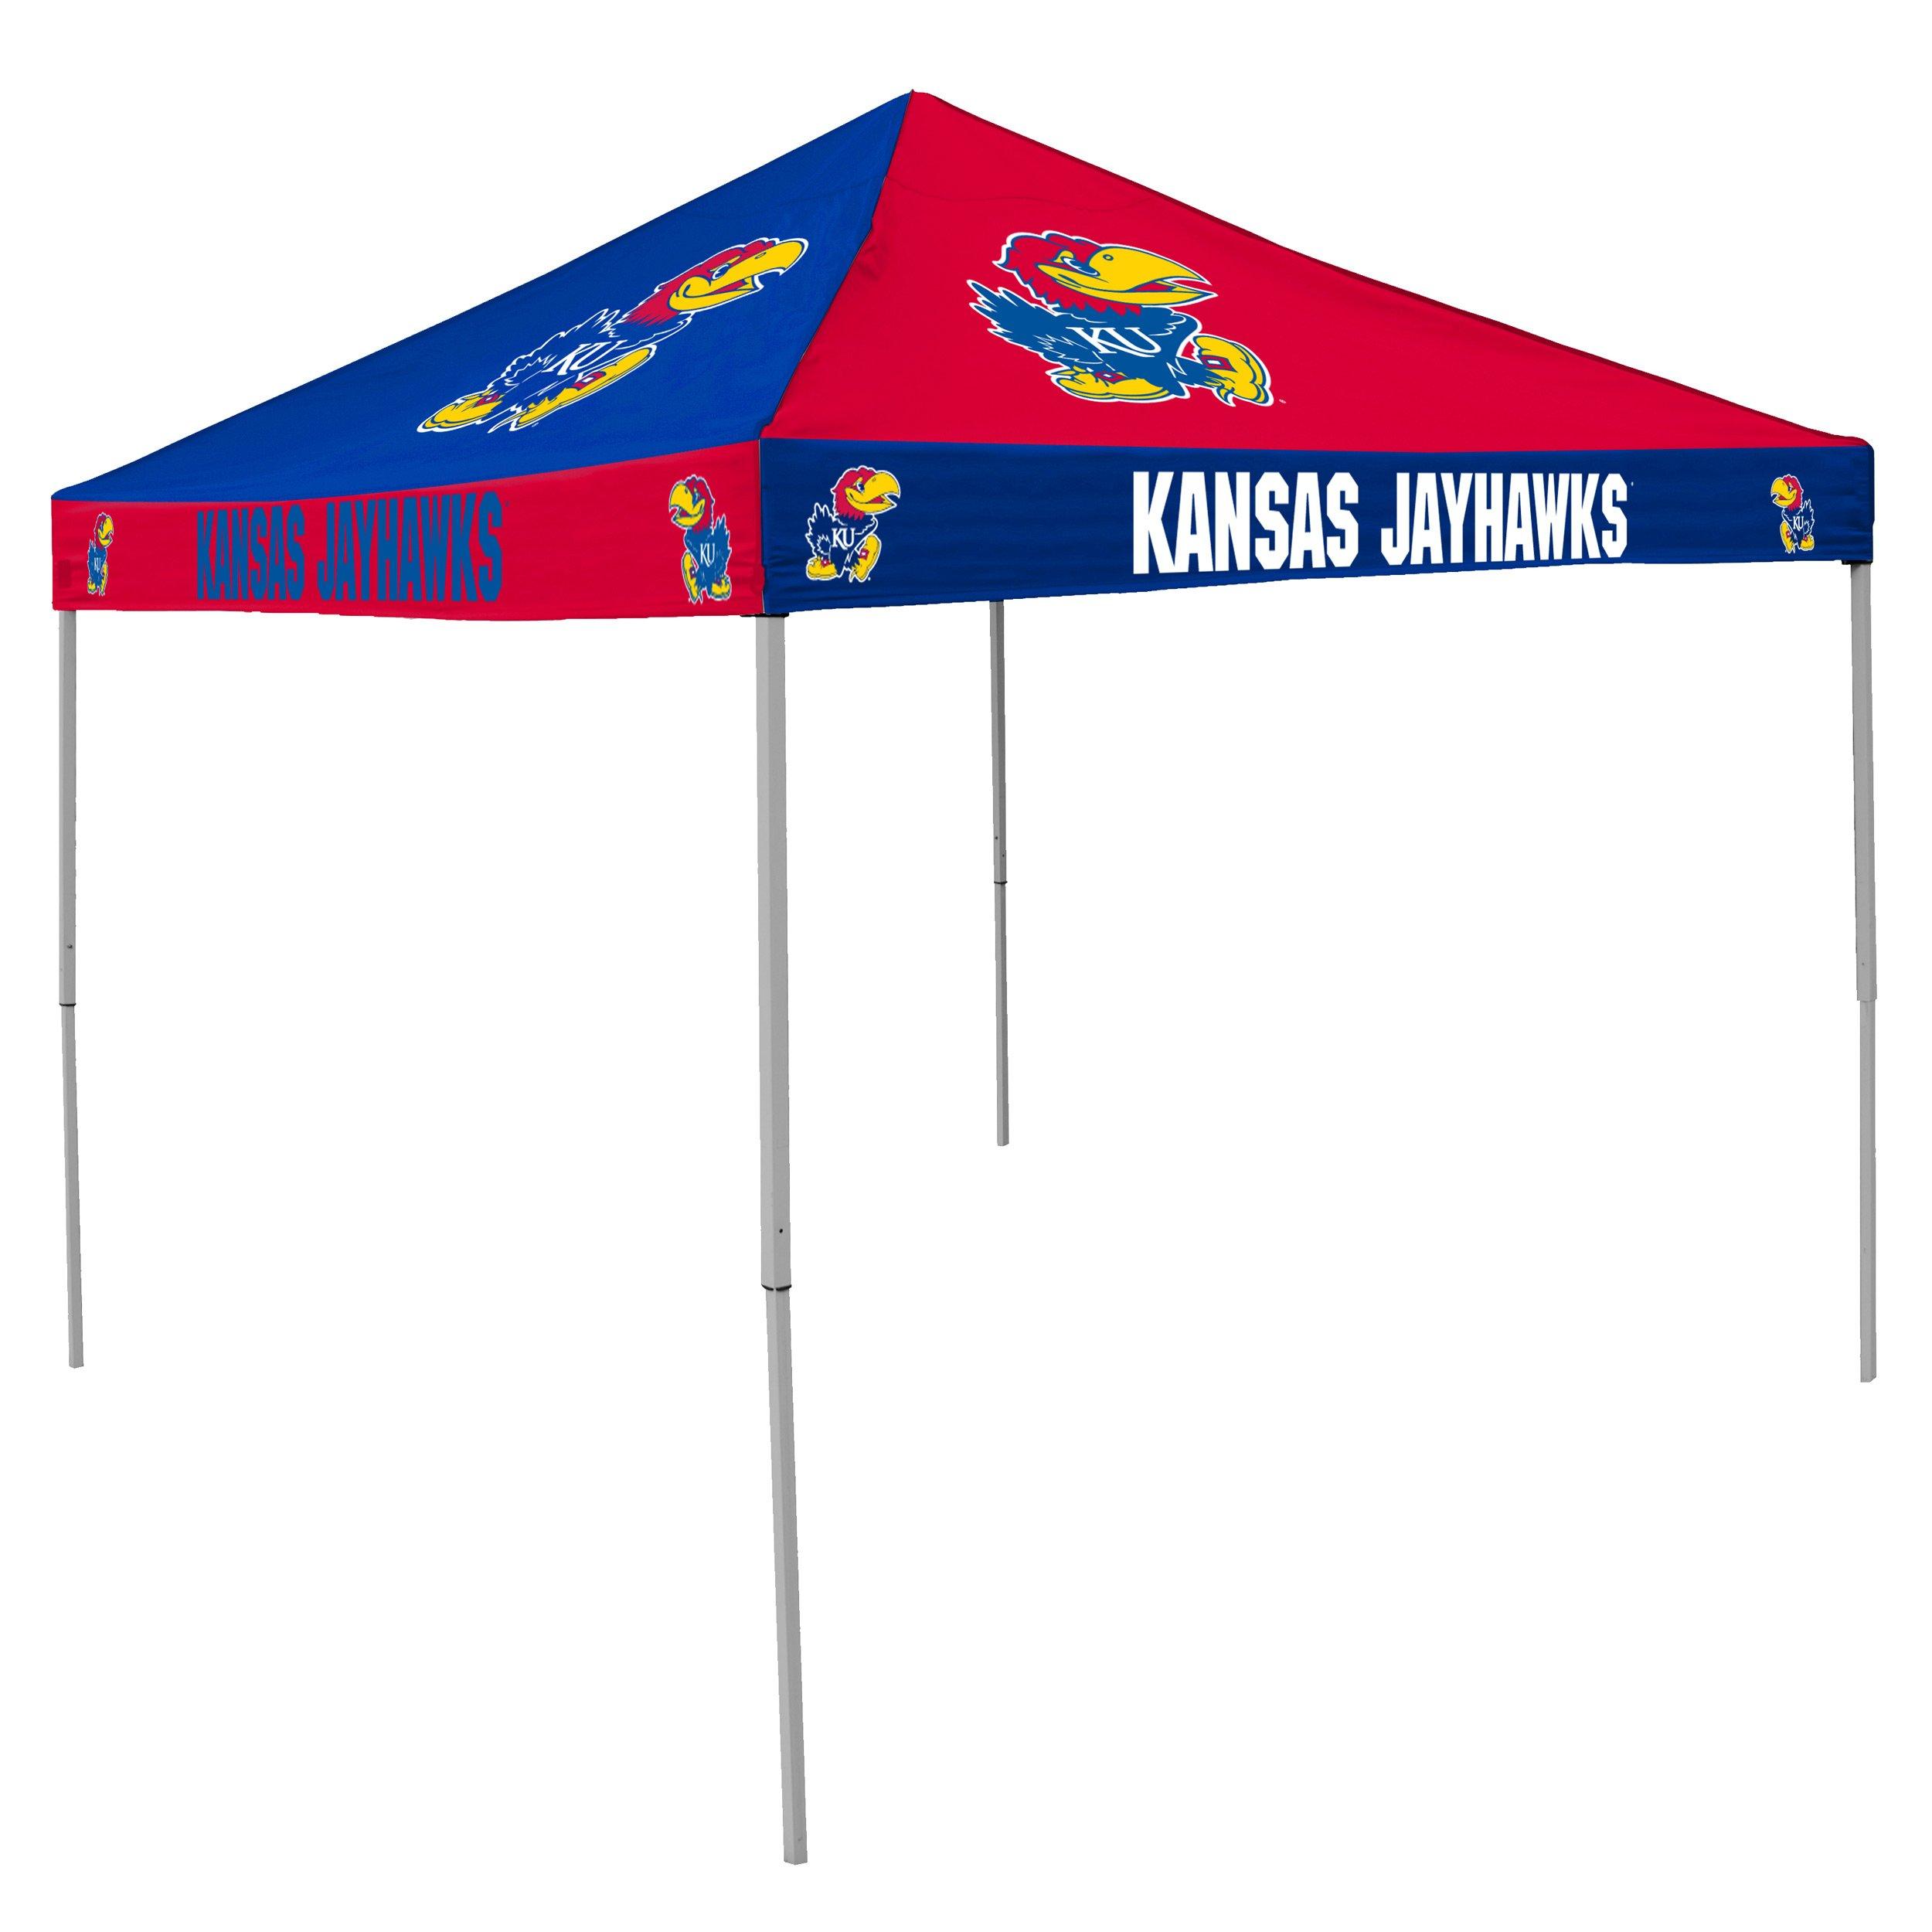 NCAA Kansas Jayhawks 9-Foot x 9-Foot Pinwheel Tailgating Canopy, Blue/Red